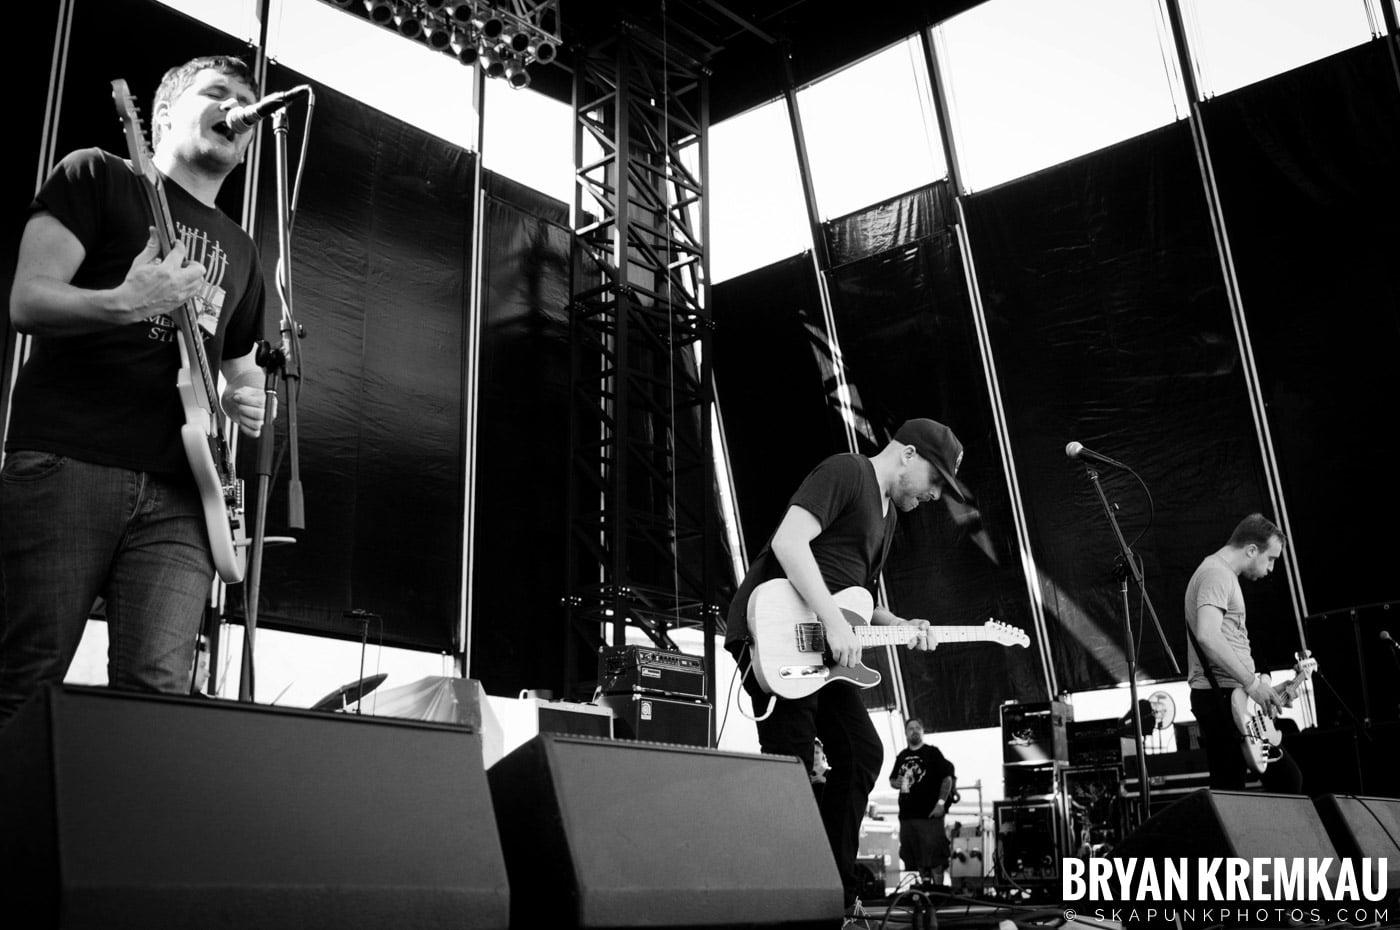 The Menzingers @ Riot Fest 2012, Williamsburg Park NY - 9.8.12 (12)